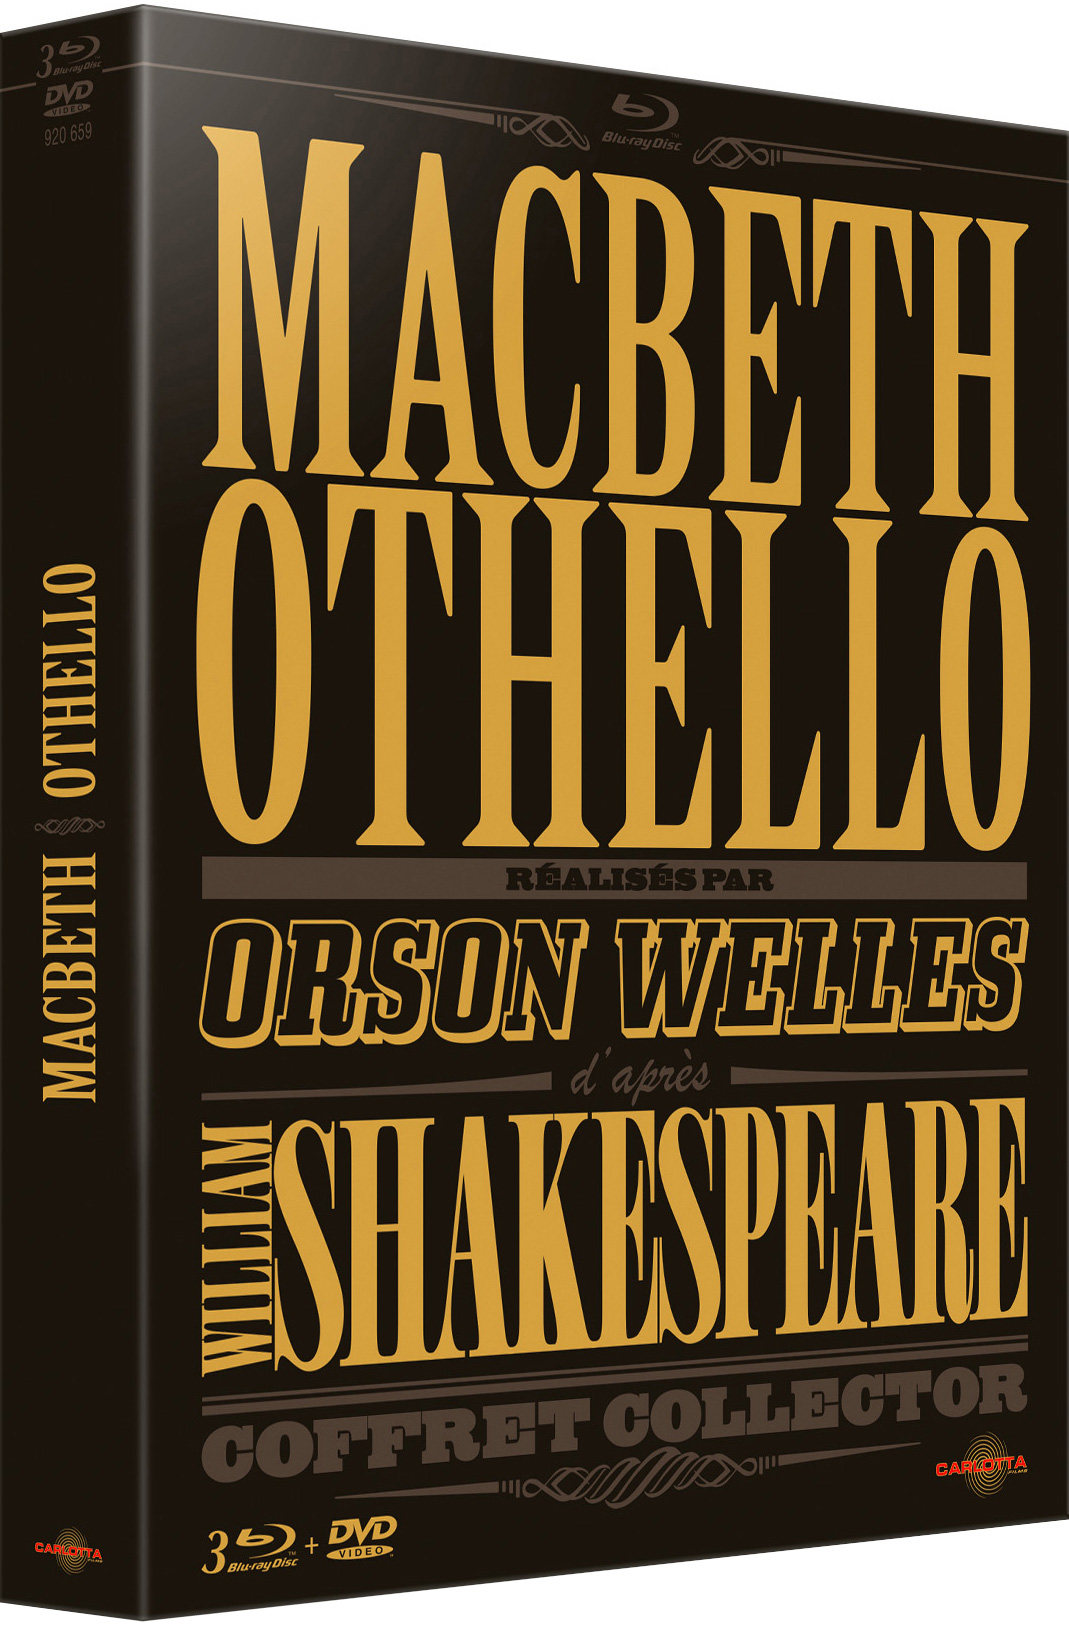 Coffret Macbeth Othello Welles